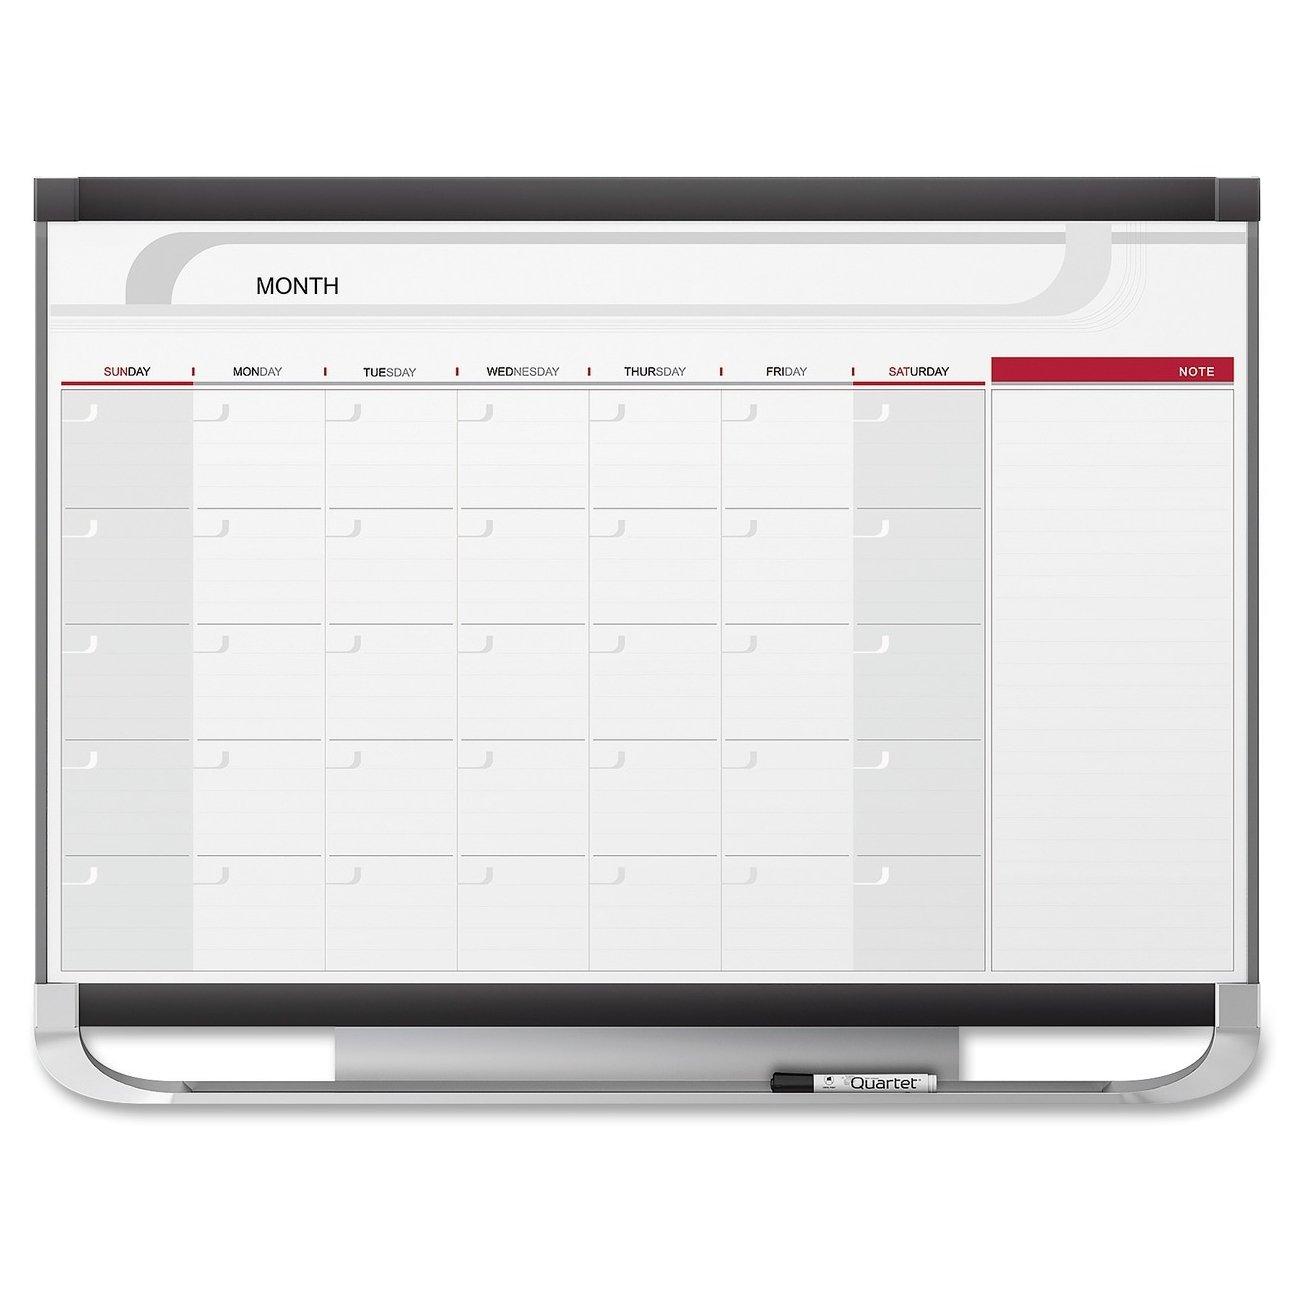 Quartet Prestige Total Erase Dry-Erase One-Month Calendar, 3 x 2 Feet, Graphite Frame (CP32)